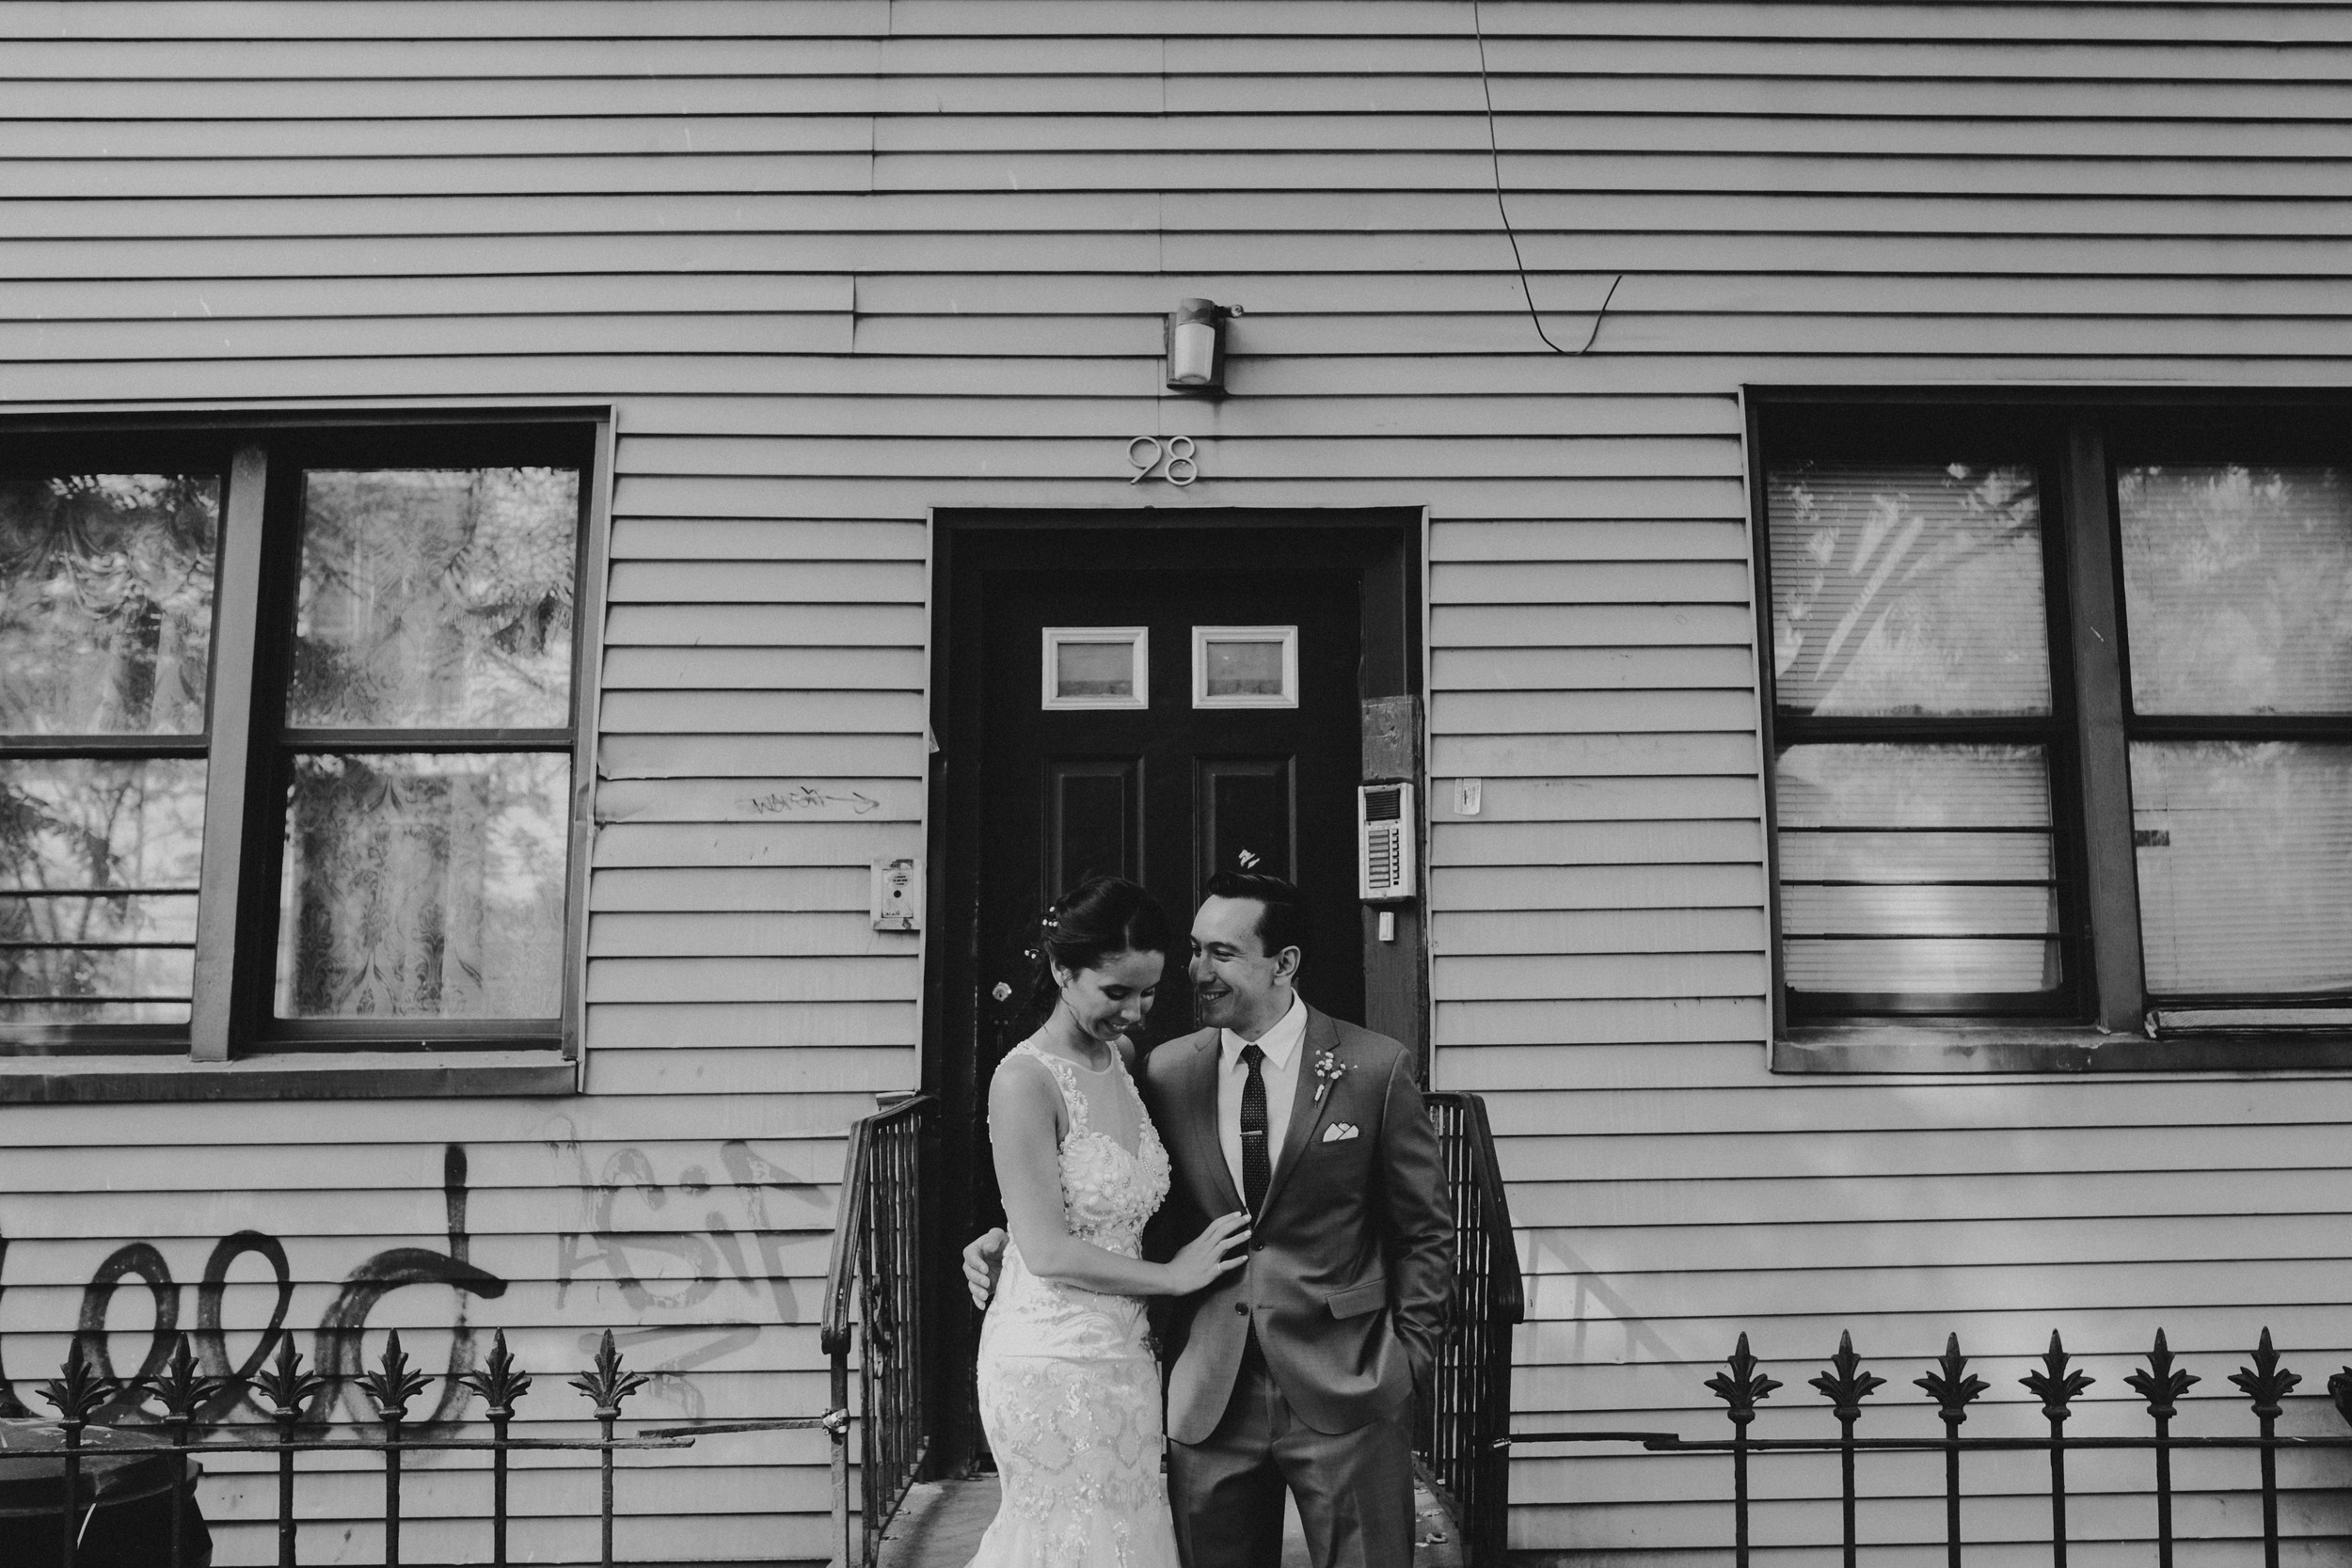 MY_MOON_WILLIAMSBURG_WEDDING 2452.jpg